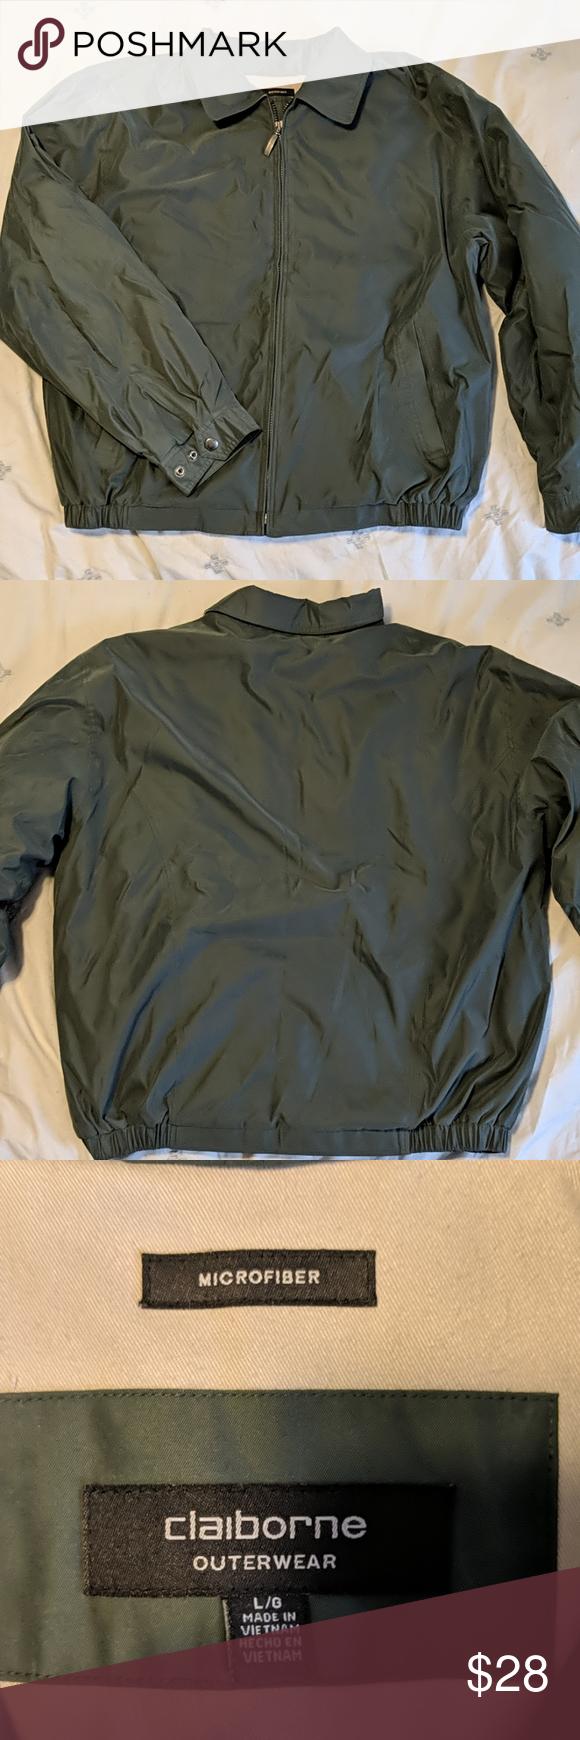 Claiborne Microfiber Jacket Jackets Claiborne Microfiber [ 1740 x 580 Pixel ]